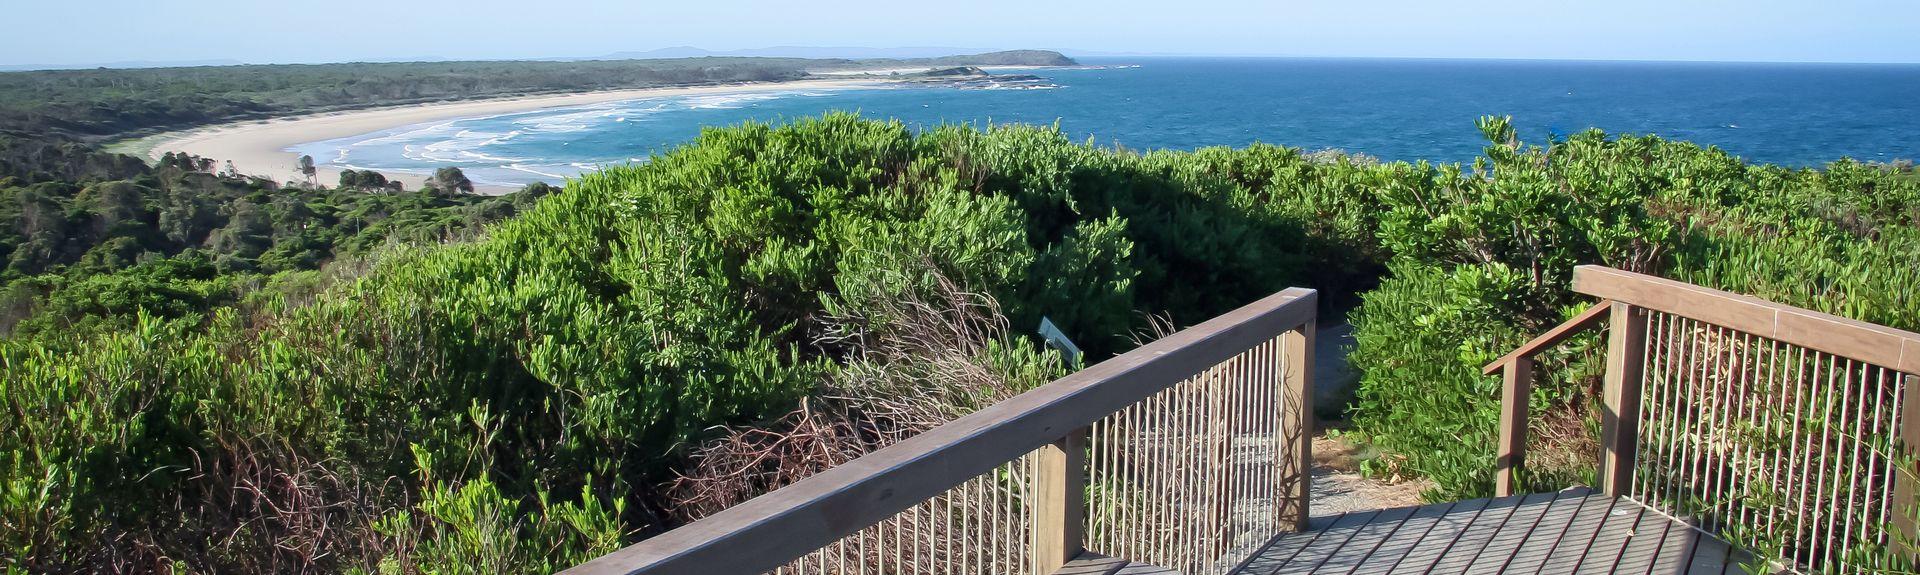 Iluka, New South Wales, Australia